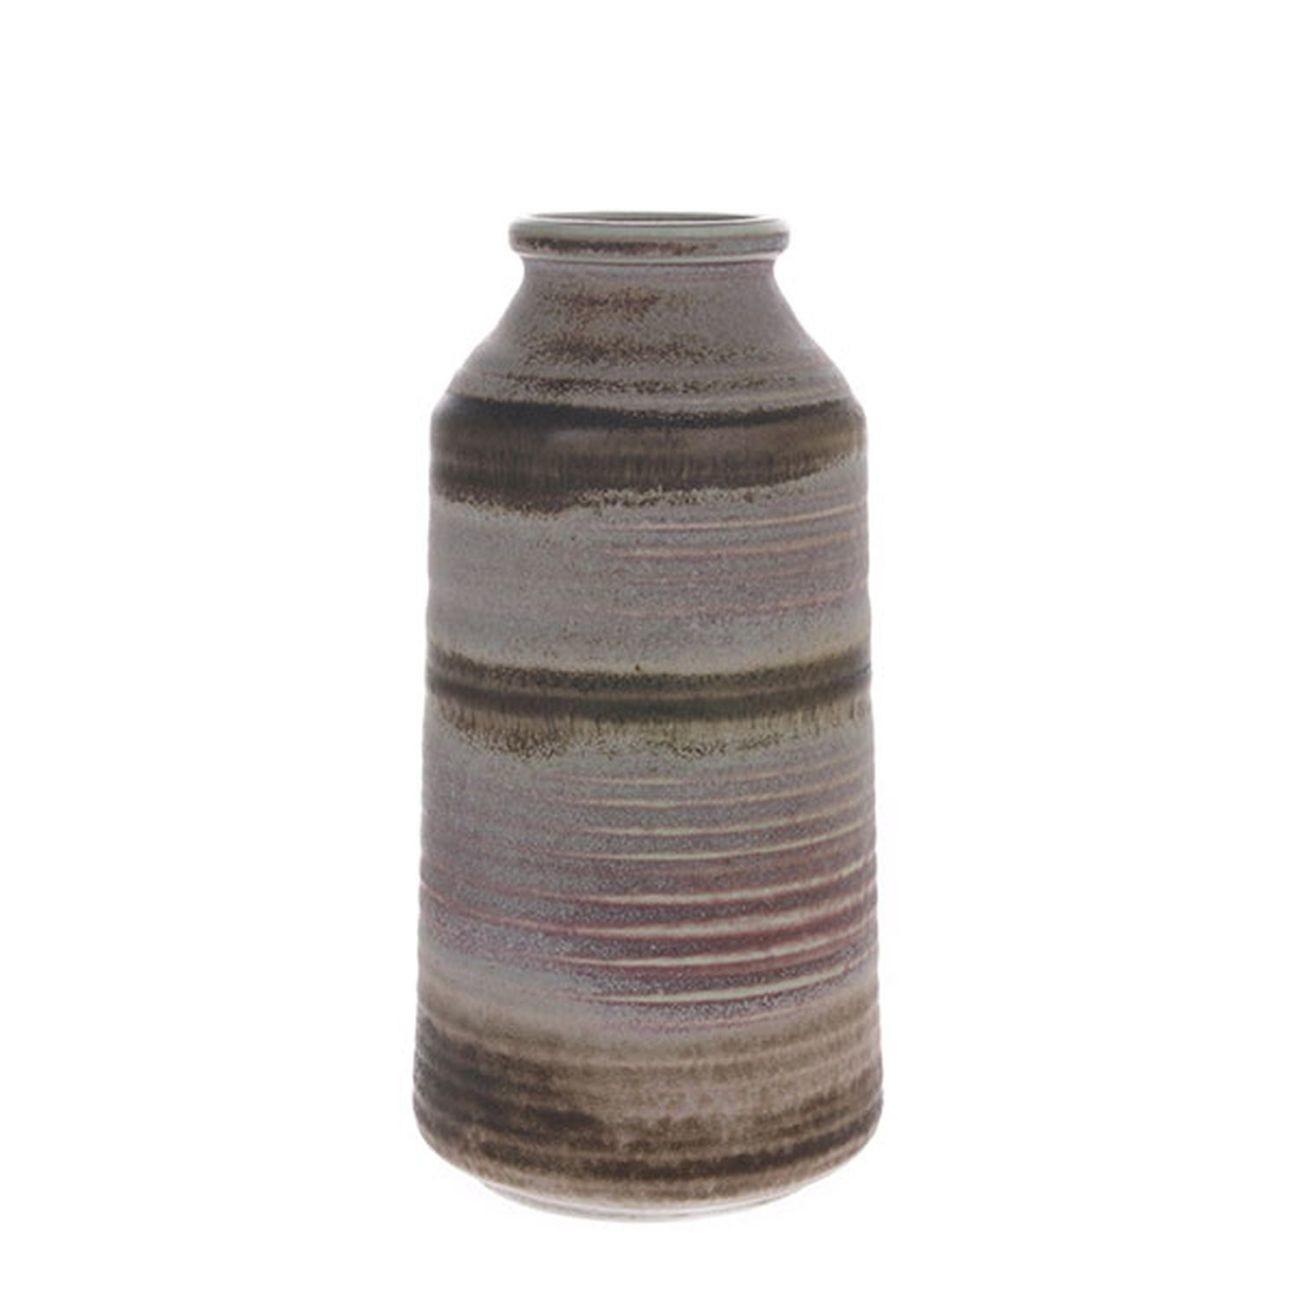 HK living ceramic Vase natural shades Blumenvase